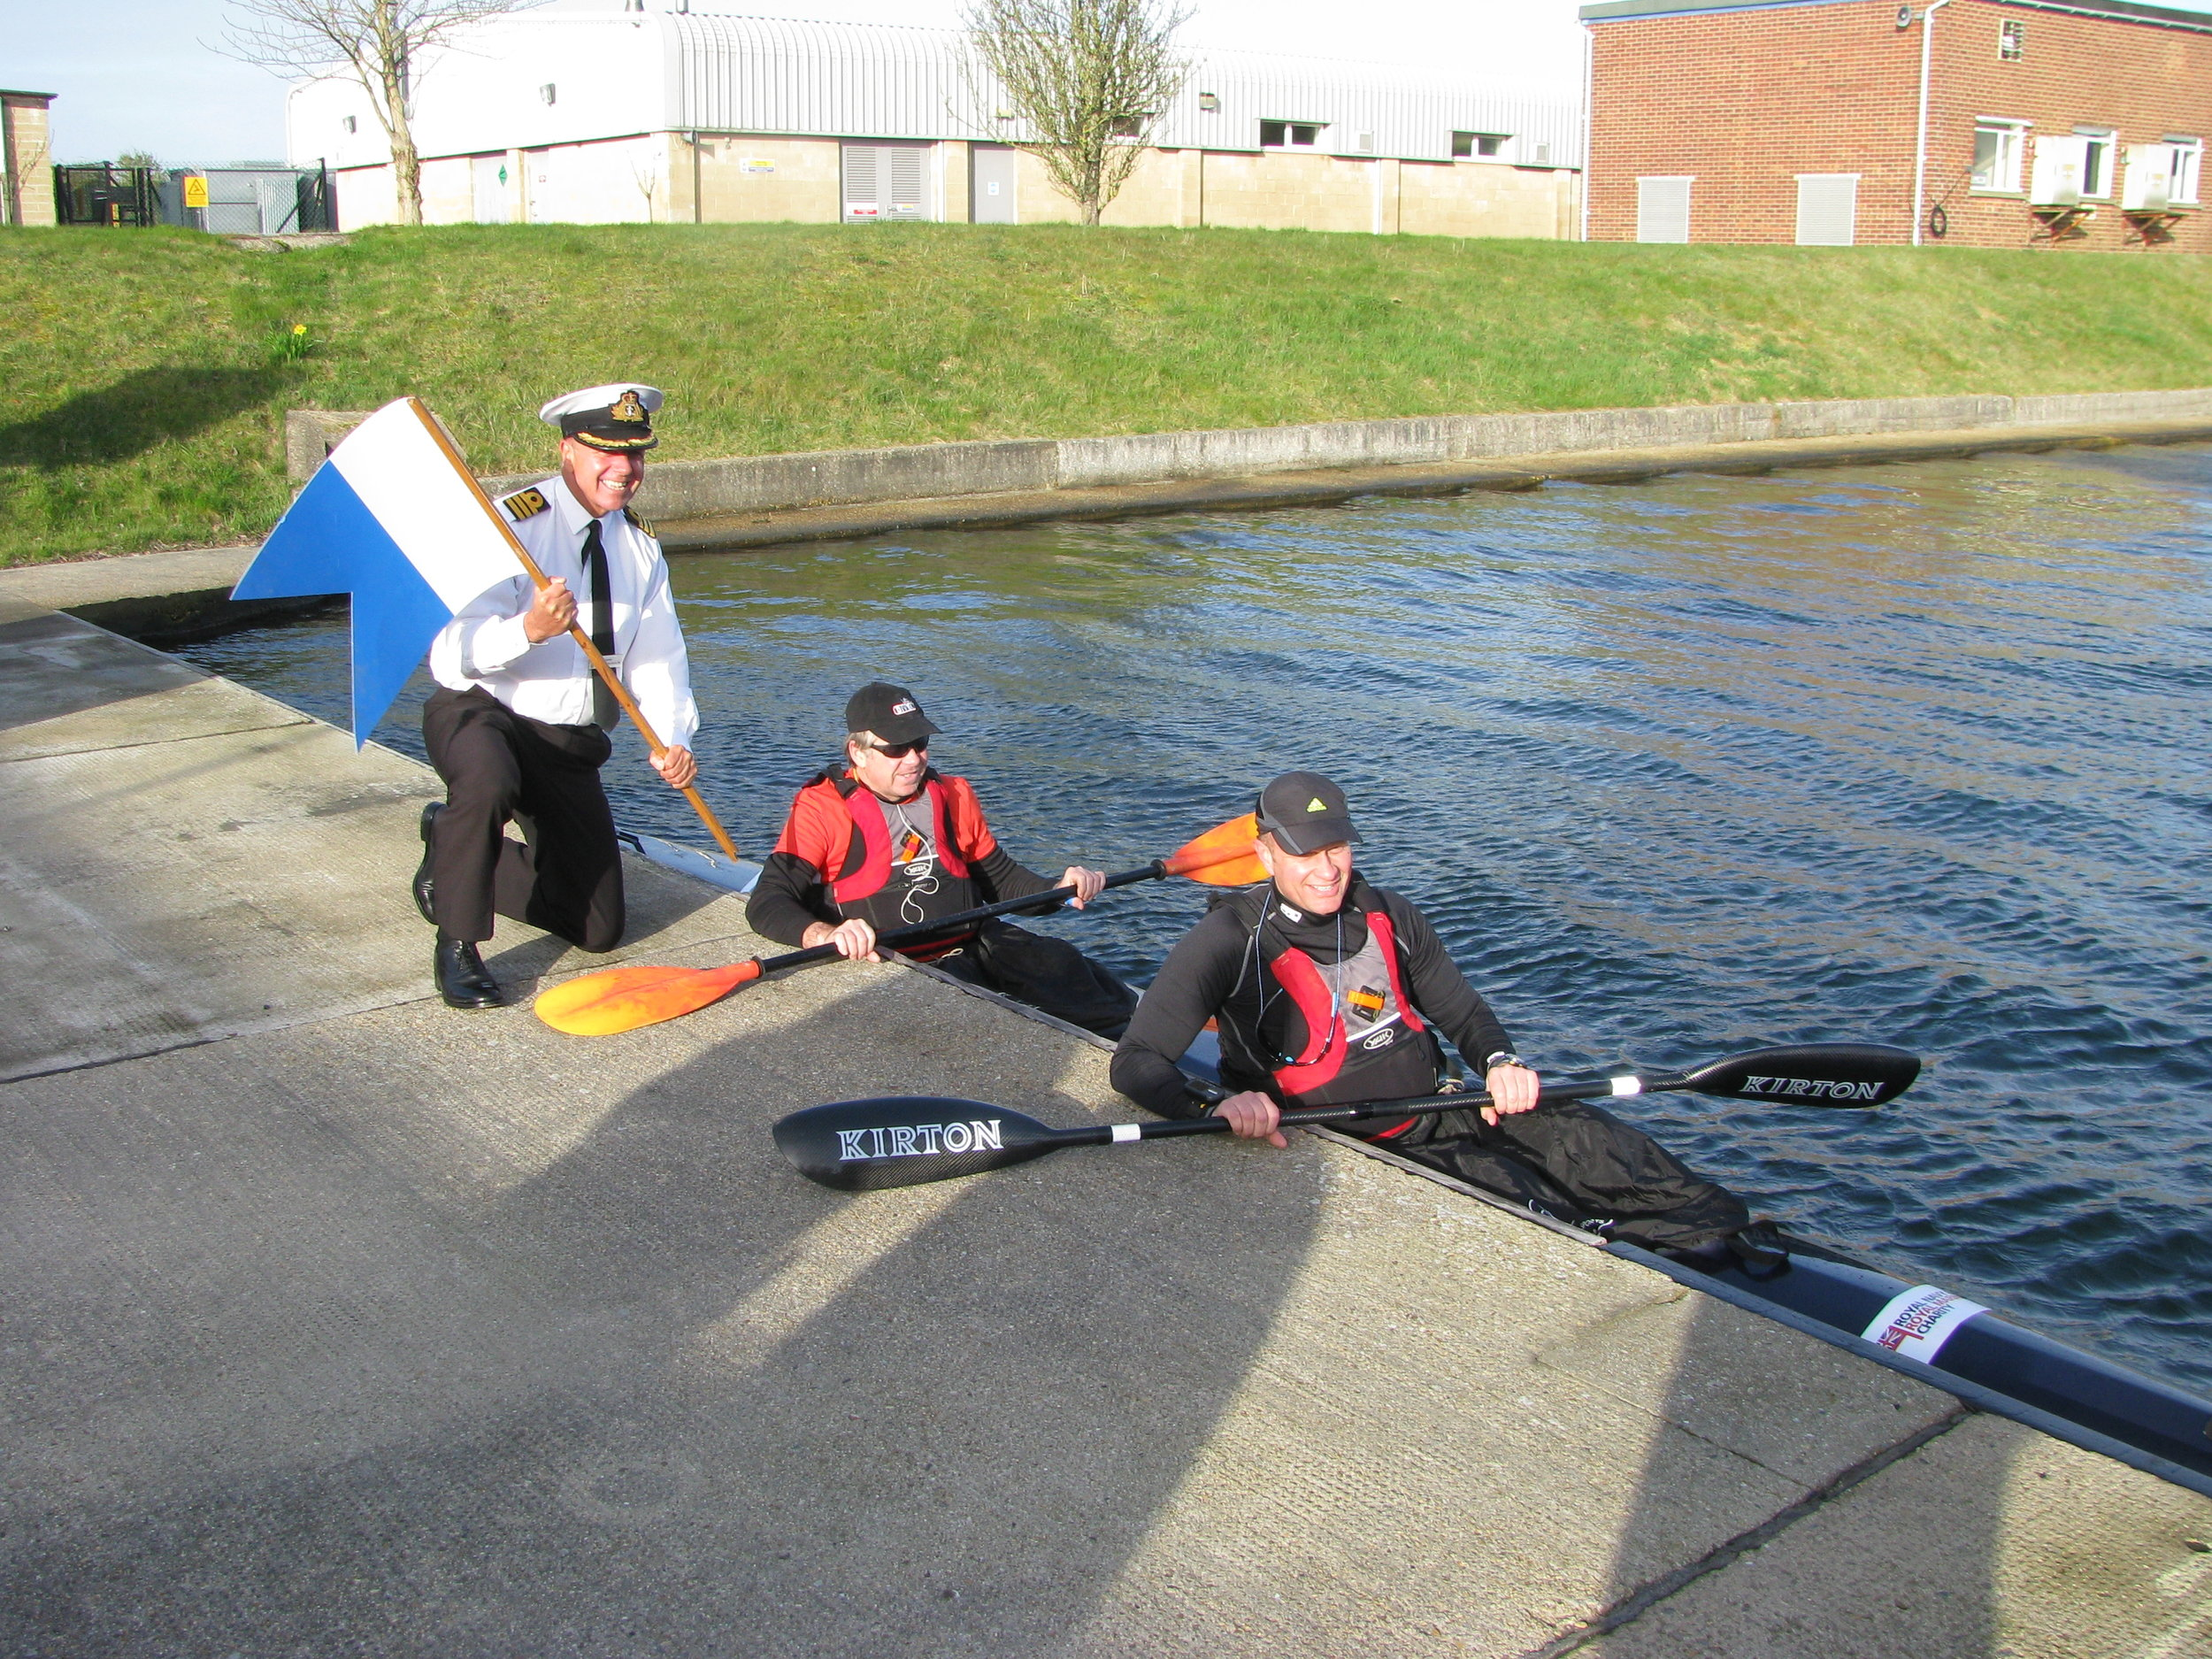 Horsea Canoe Challenge 18 Apr 2013 005.jpg